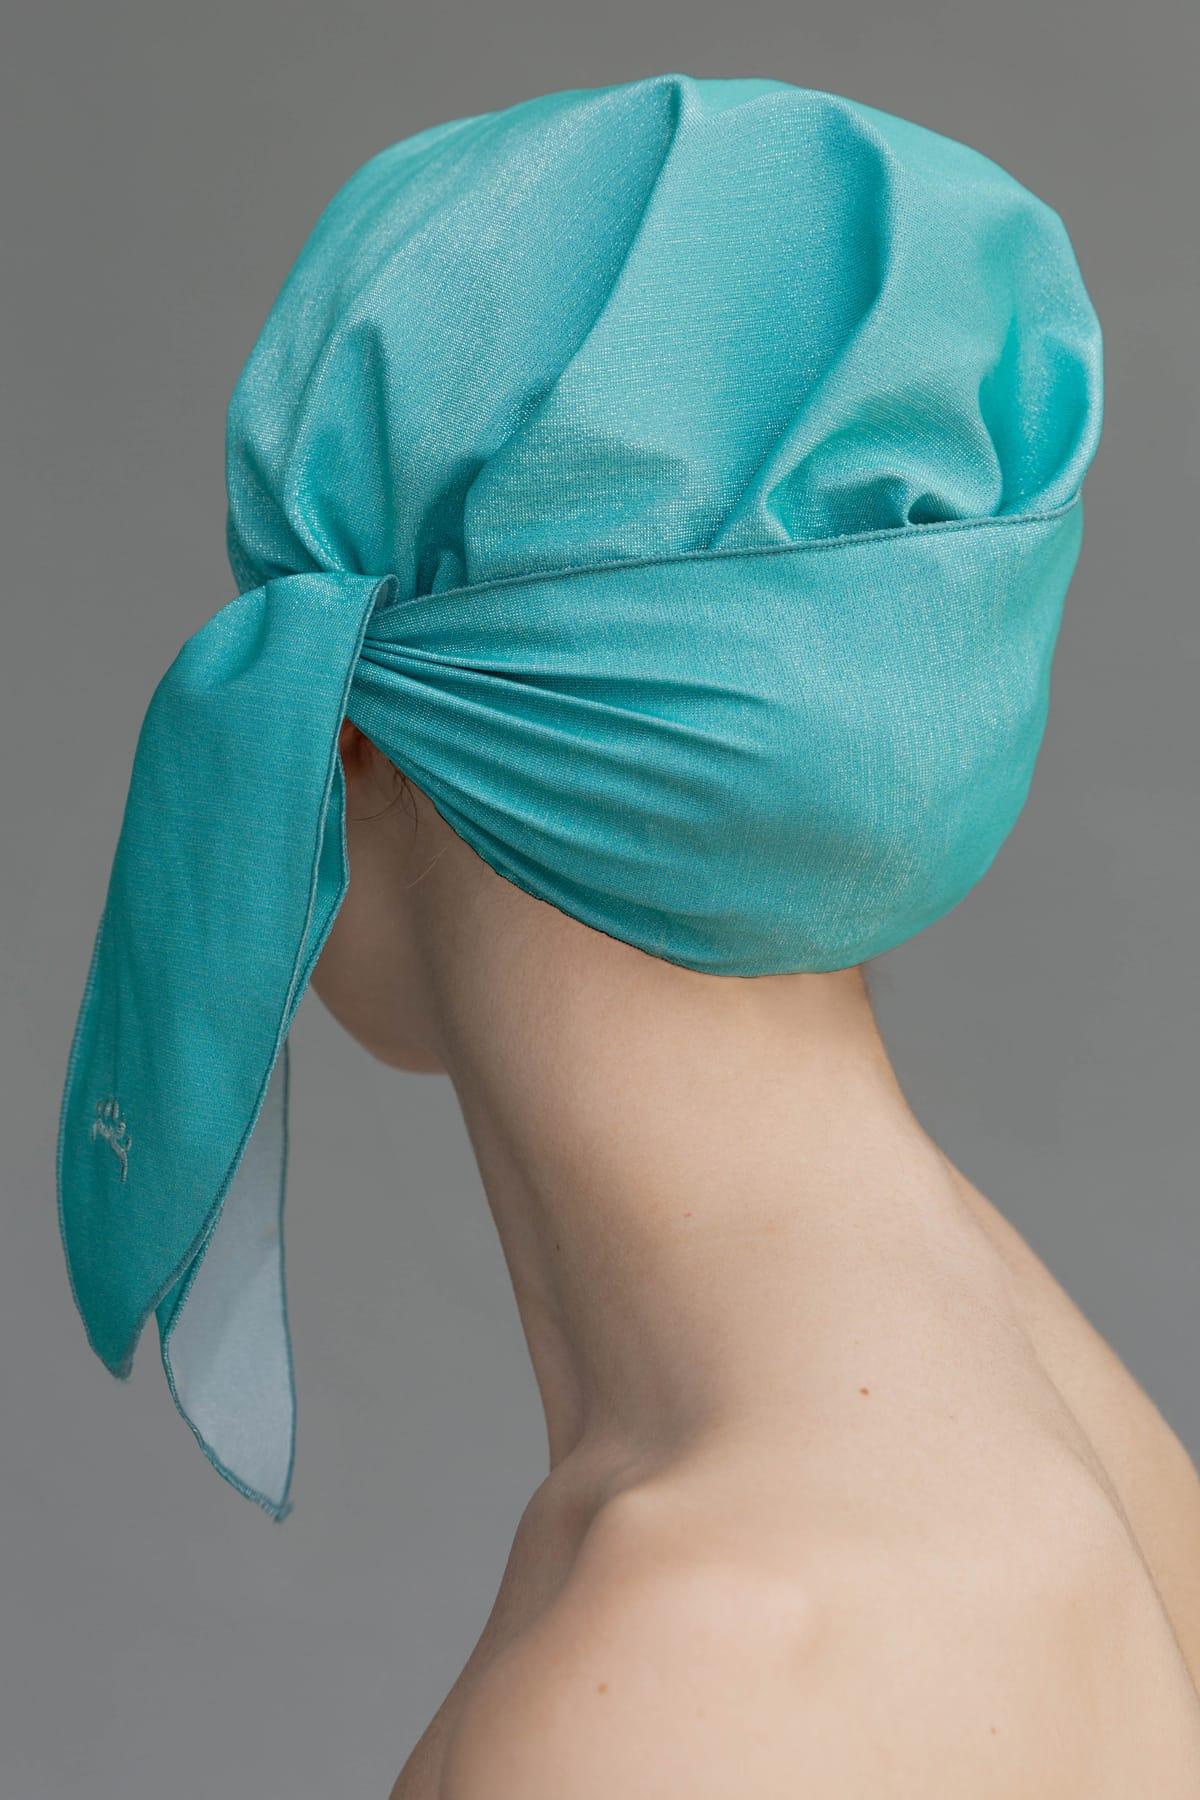 Chica con gorro de ducha visto por detrás color turquesa